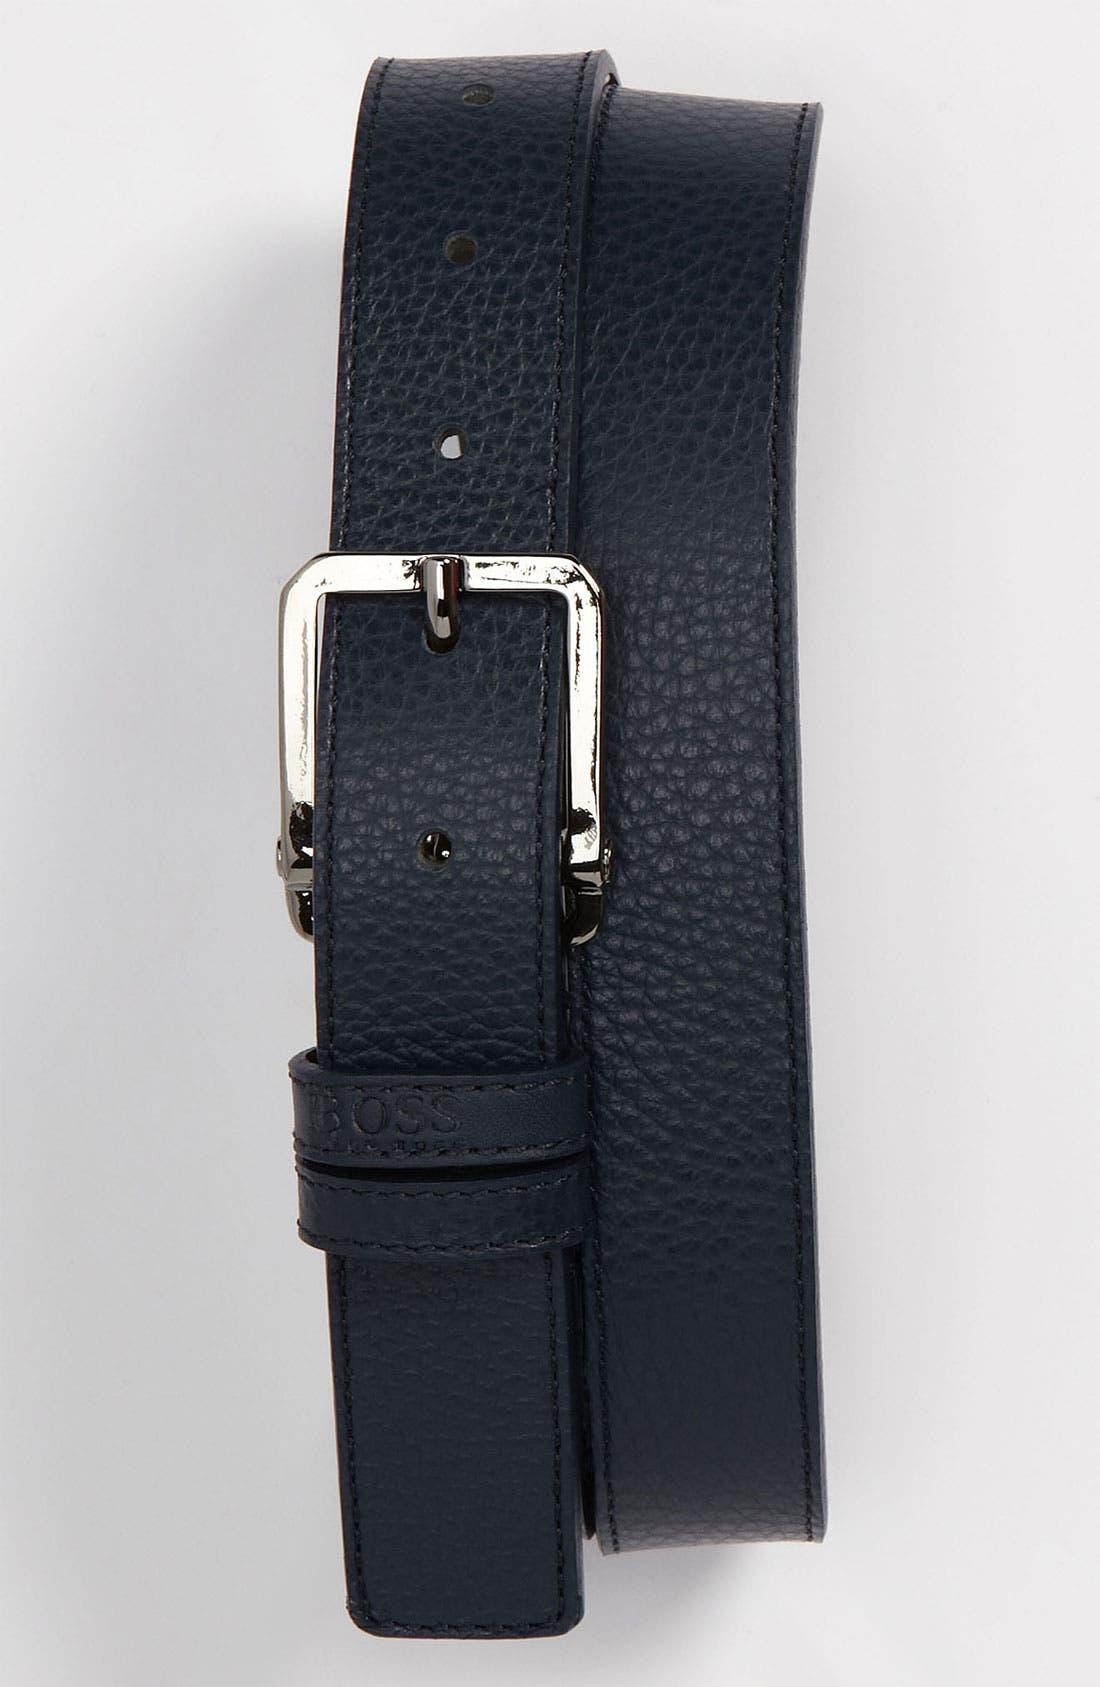 Alternate Image 1 Selected - BOSS HUGO BOSS 'Crosby' Leather Belt